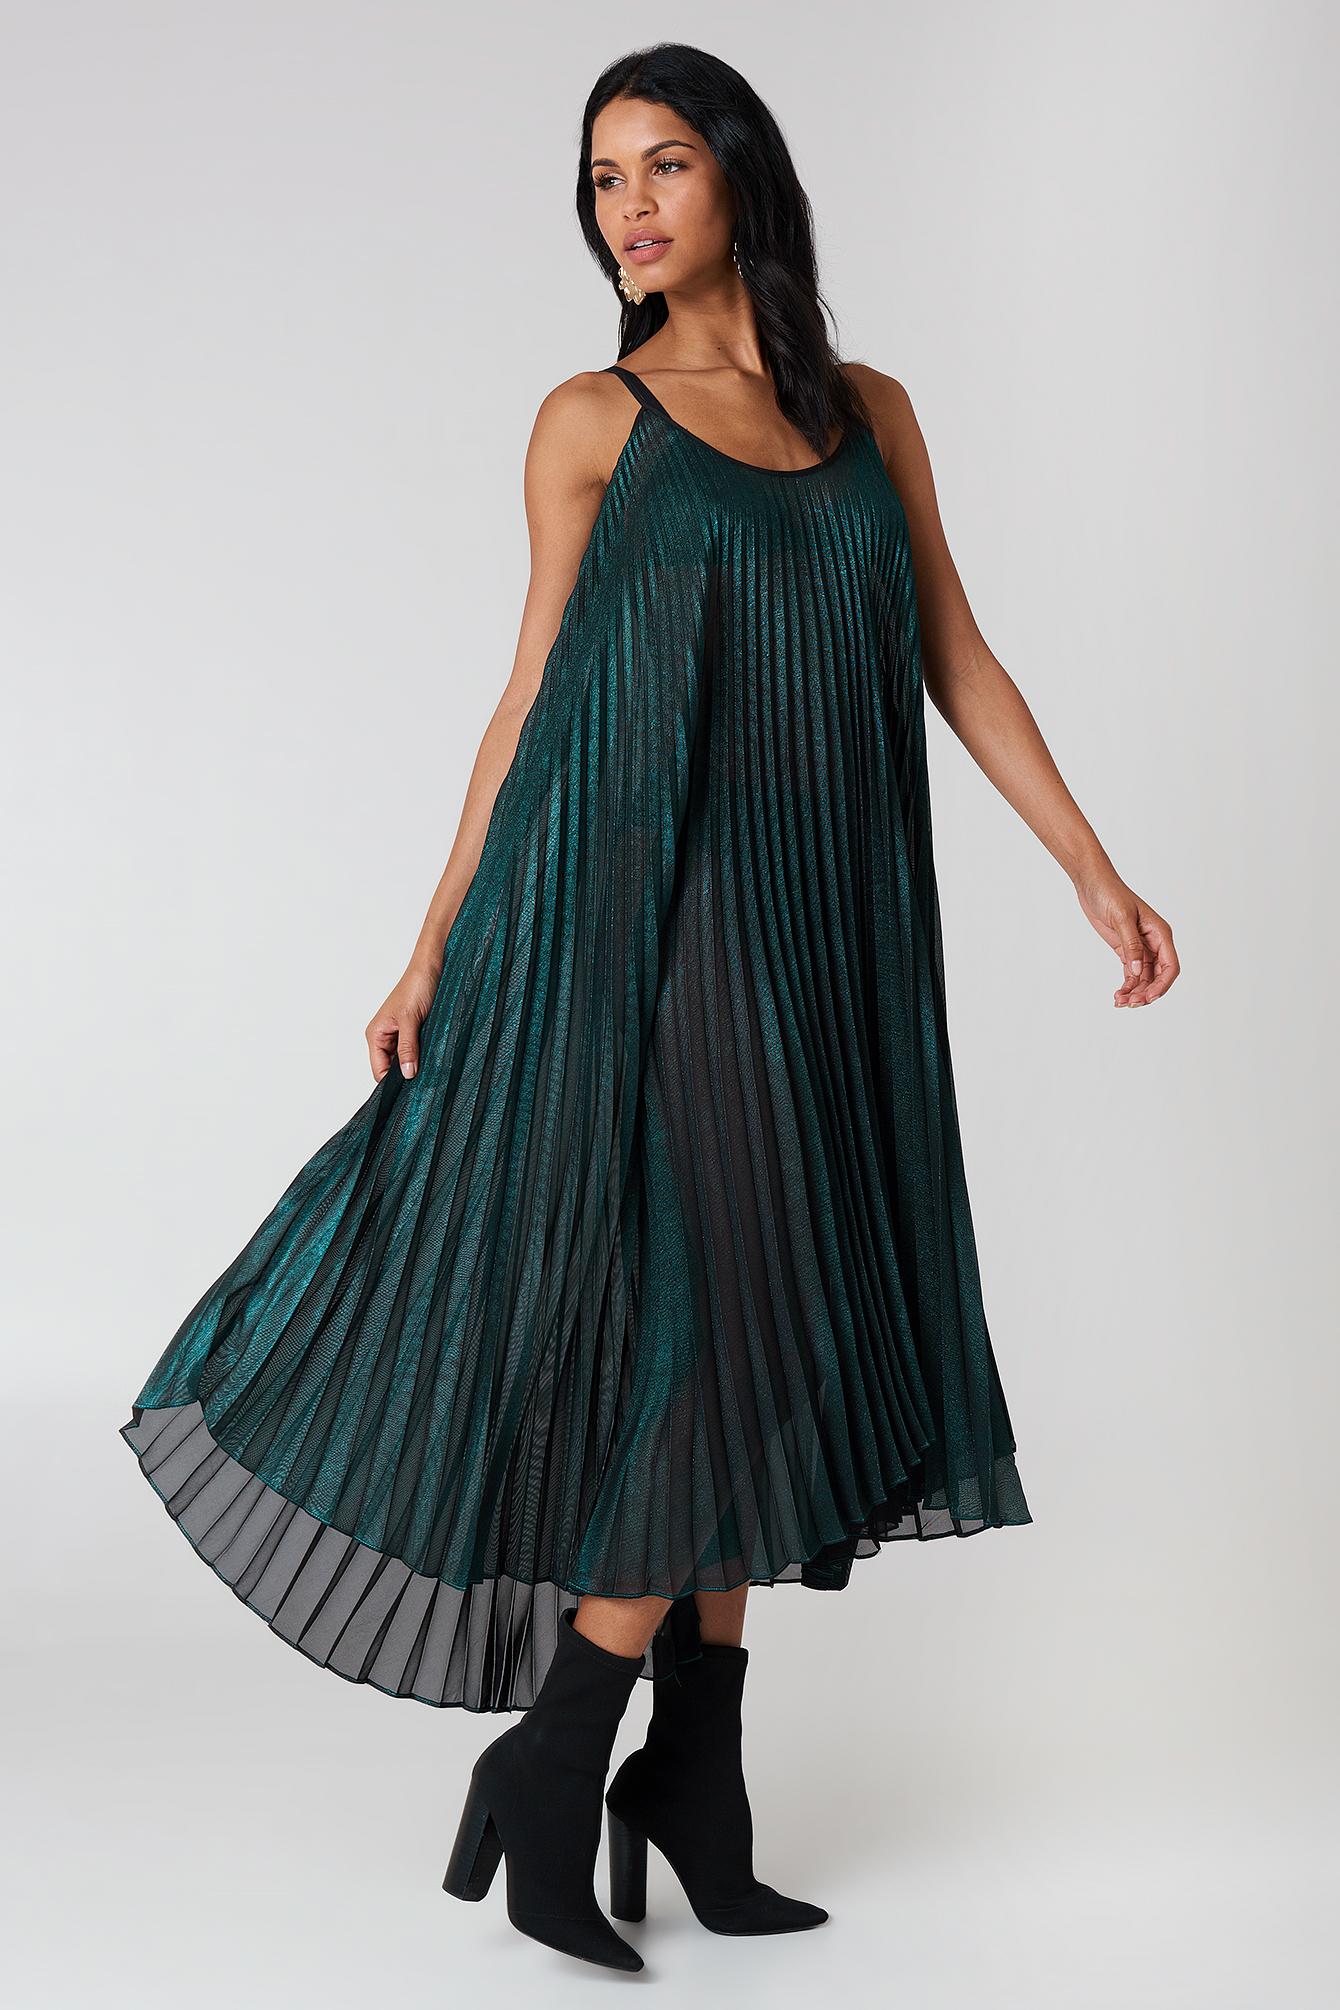 ABITO TESSUTO DRESS - GREEN